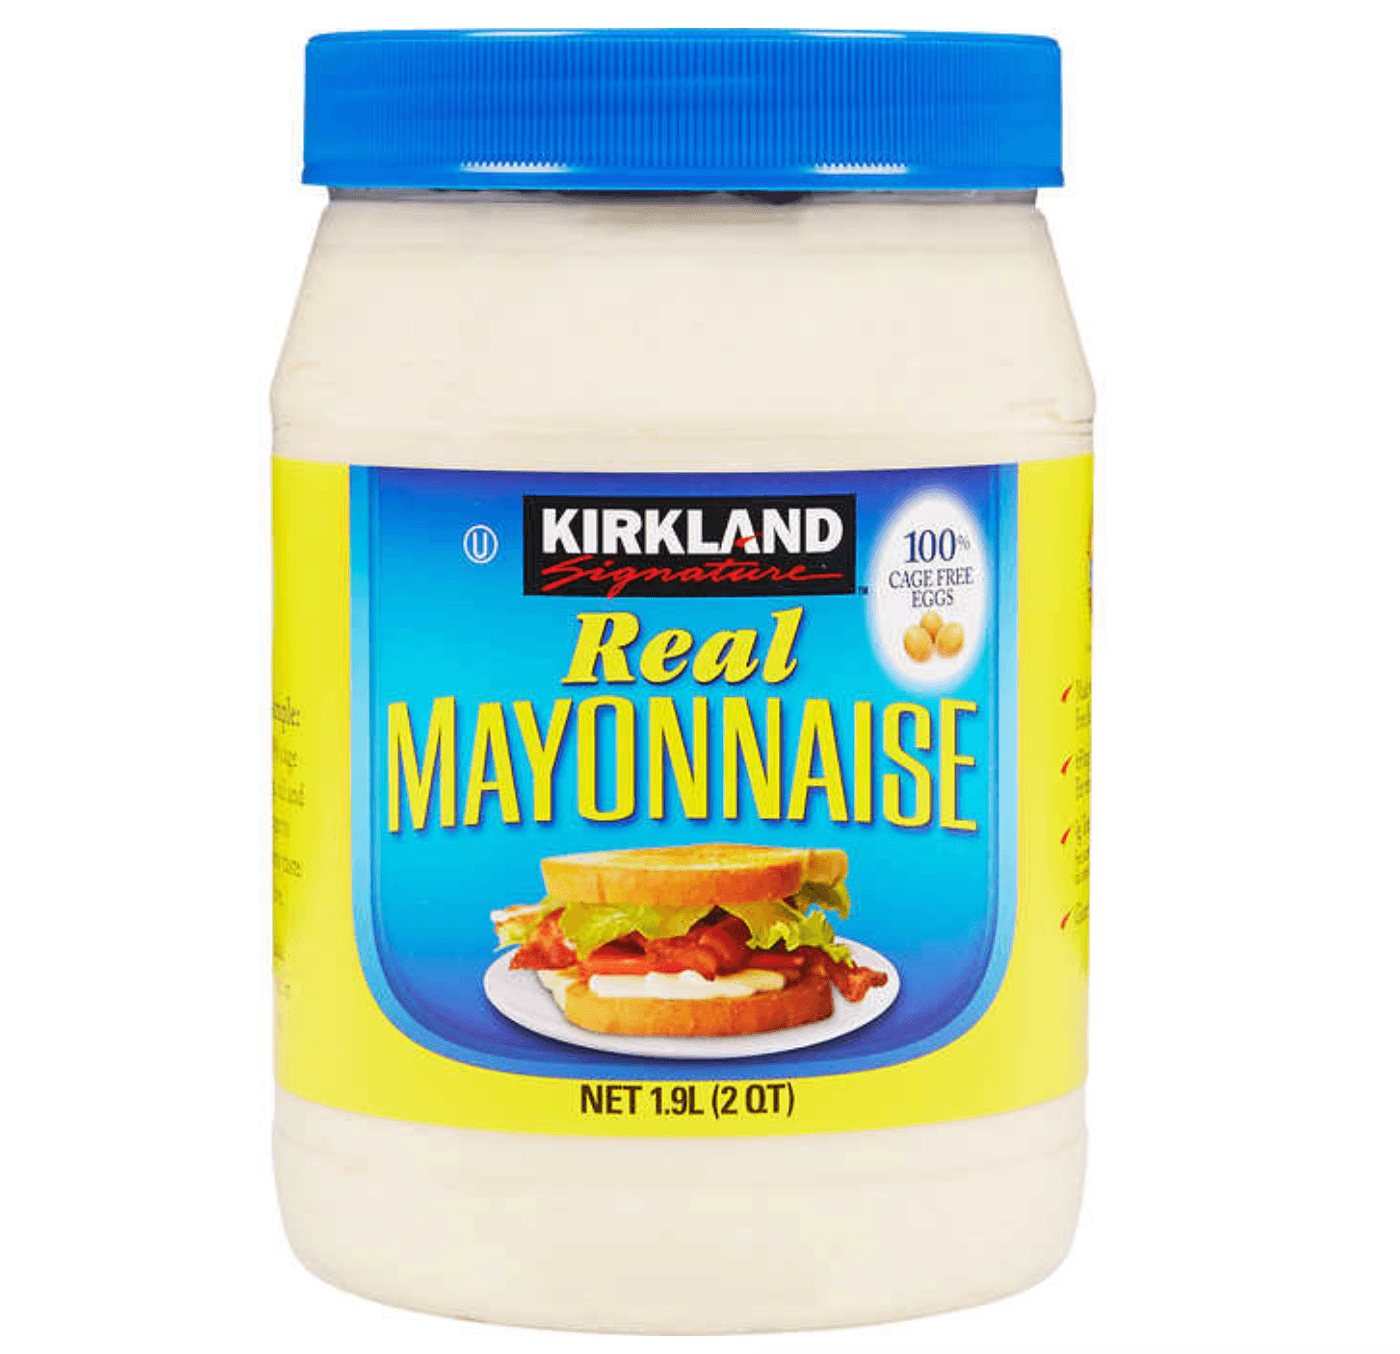 Kirkland Mayonnaise